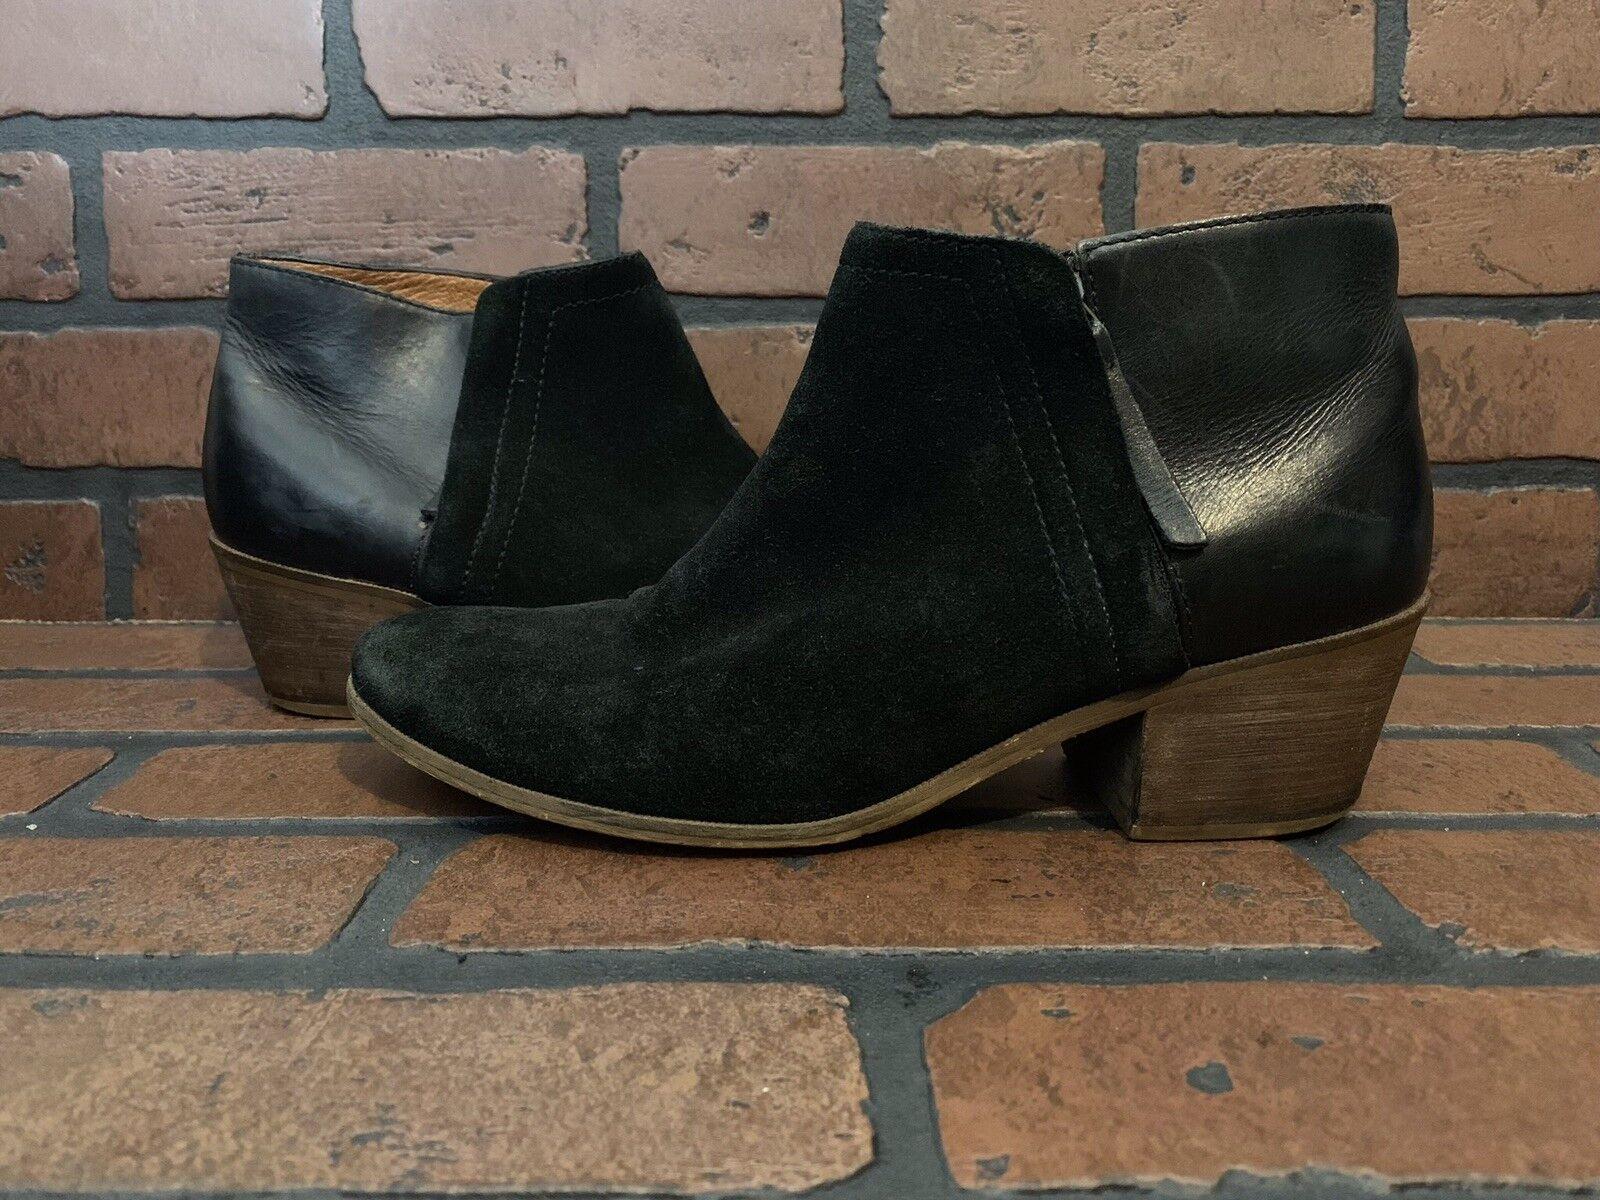 Madewell Cait Chaussons Noir Cuir Daim Taille 9.5 E2237